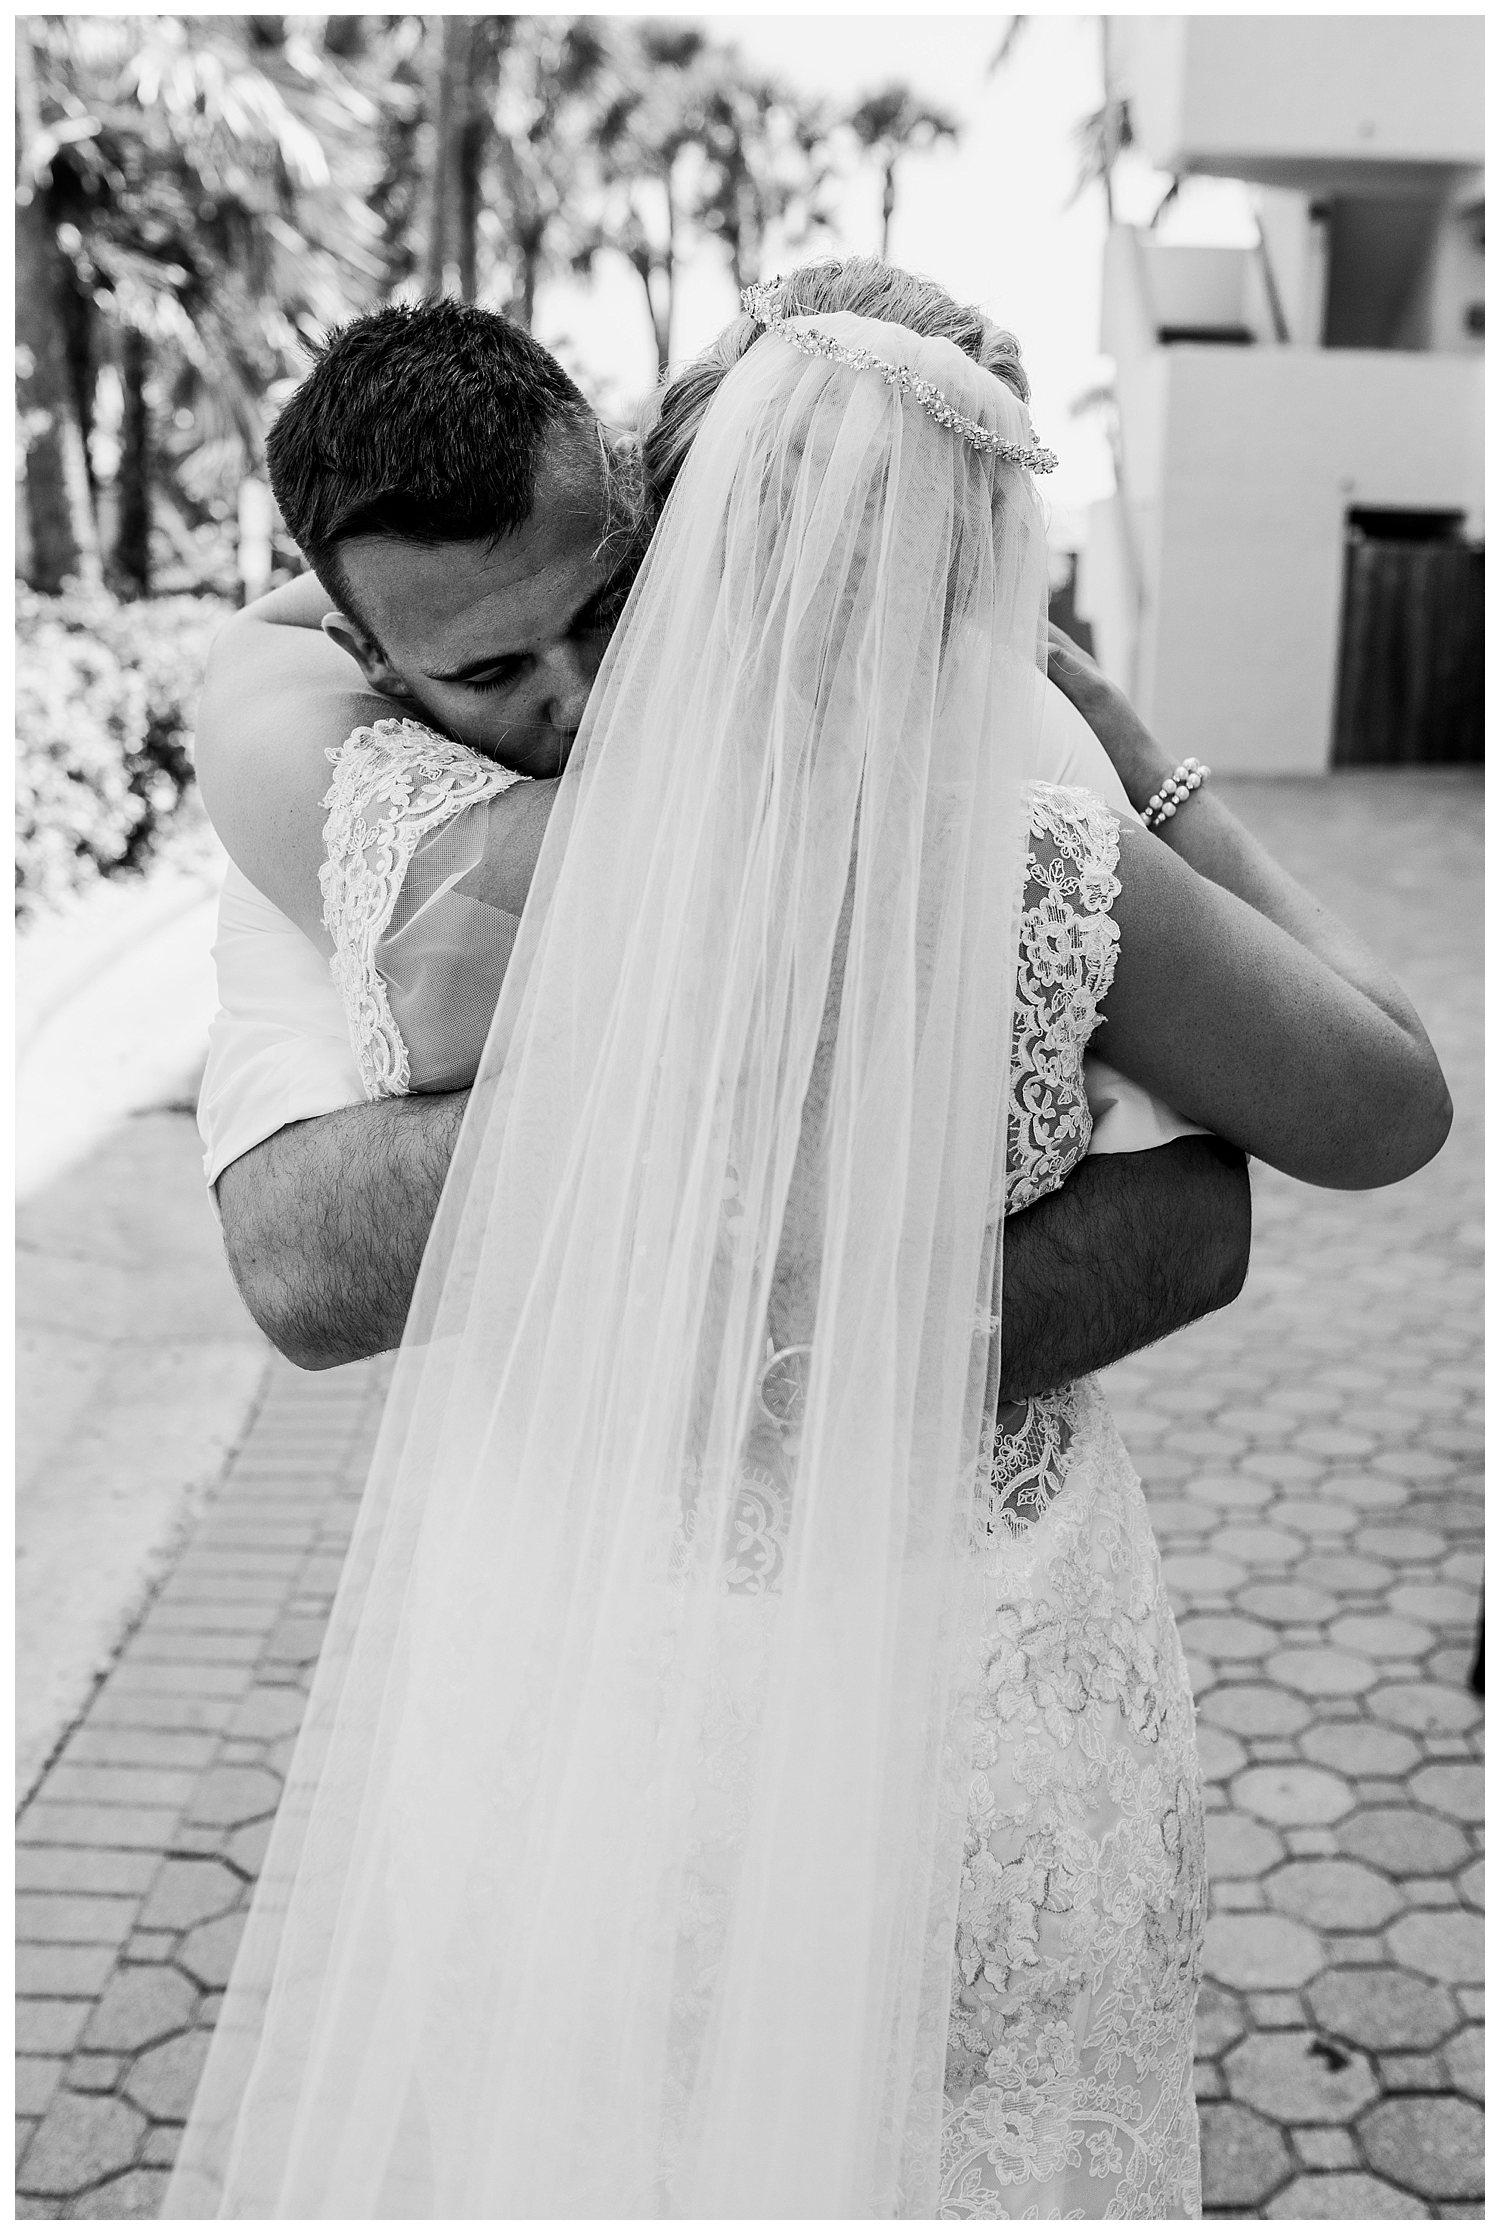 Kelsey_Diane_Photography_Destination_Wedding_Sarasota_Florida_Beach_Wedding_Alex_Austin_0634.jpg